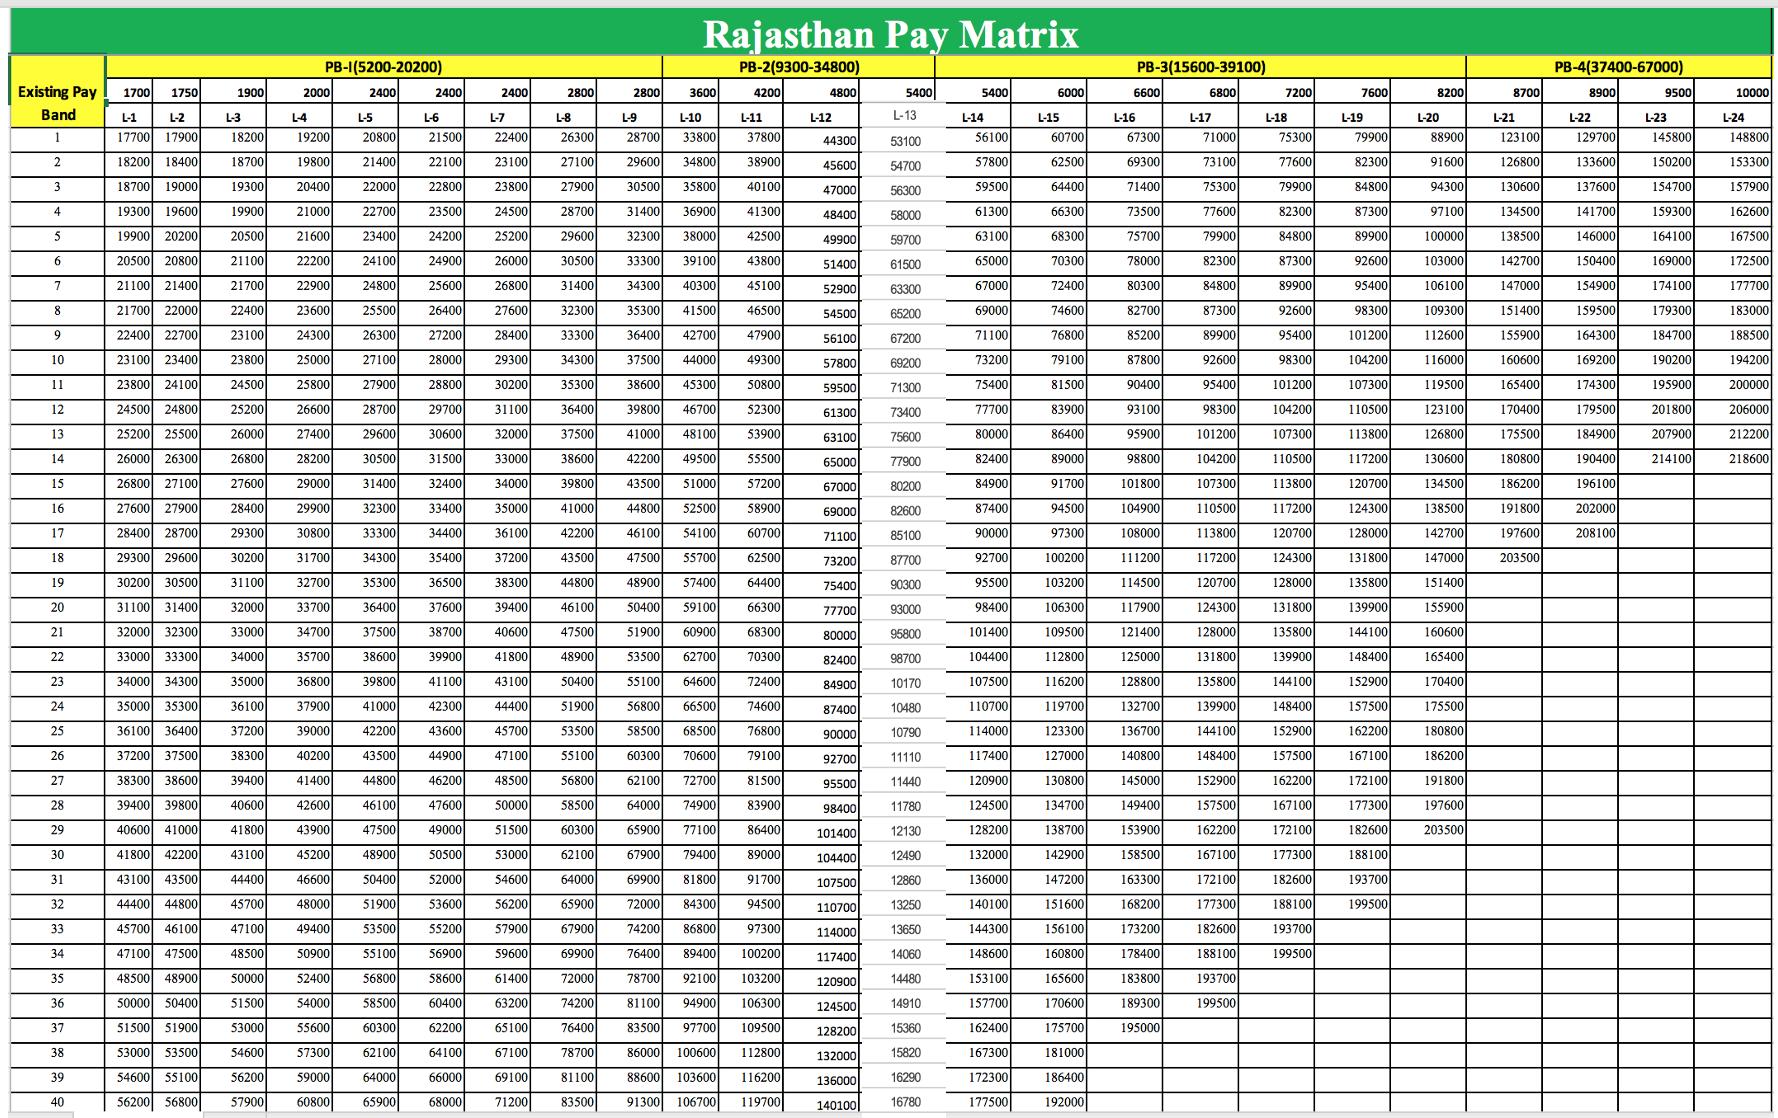 Rajasthan 7th Pay Matrix